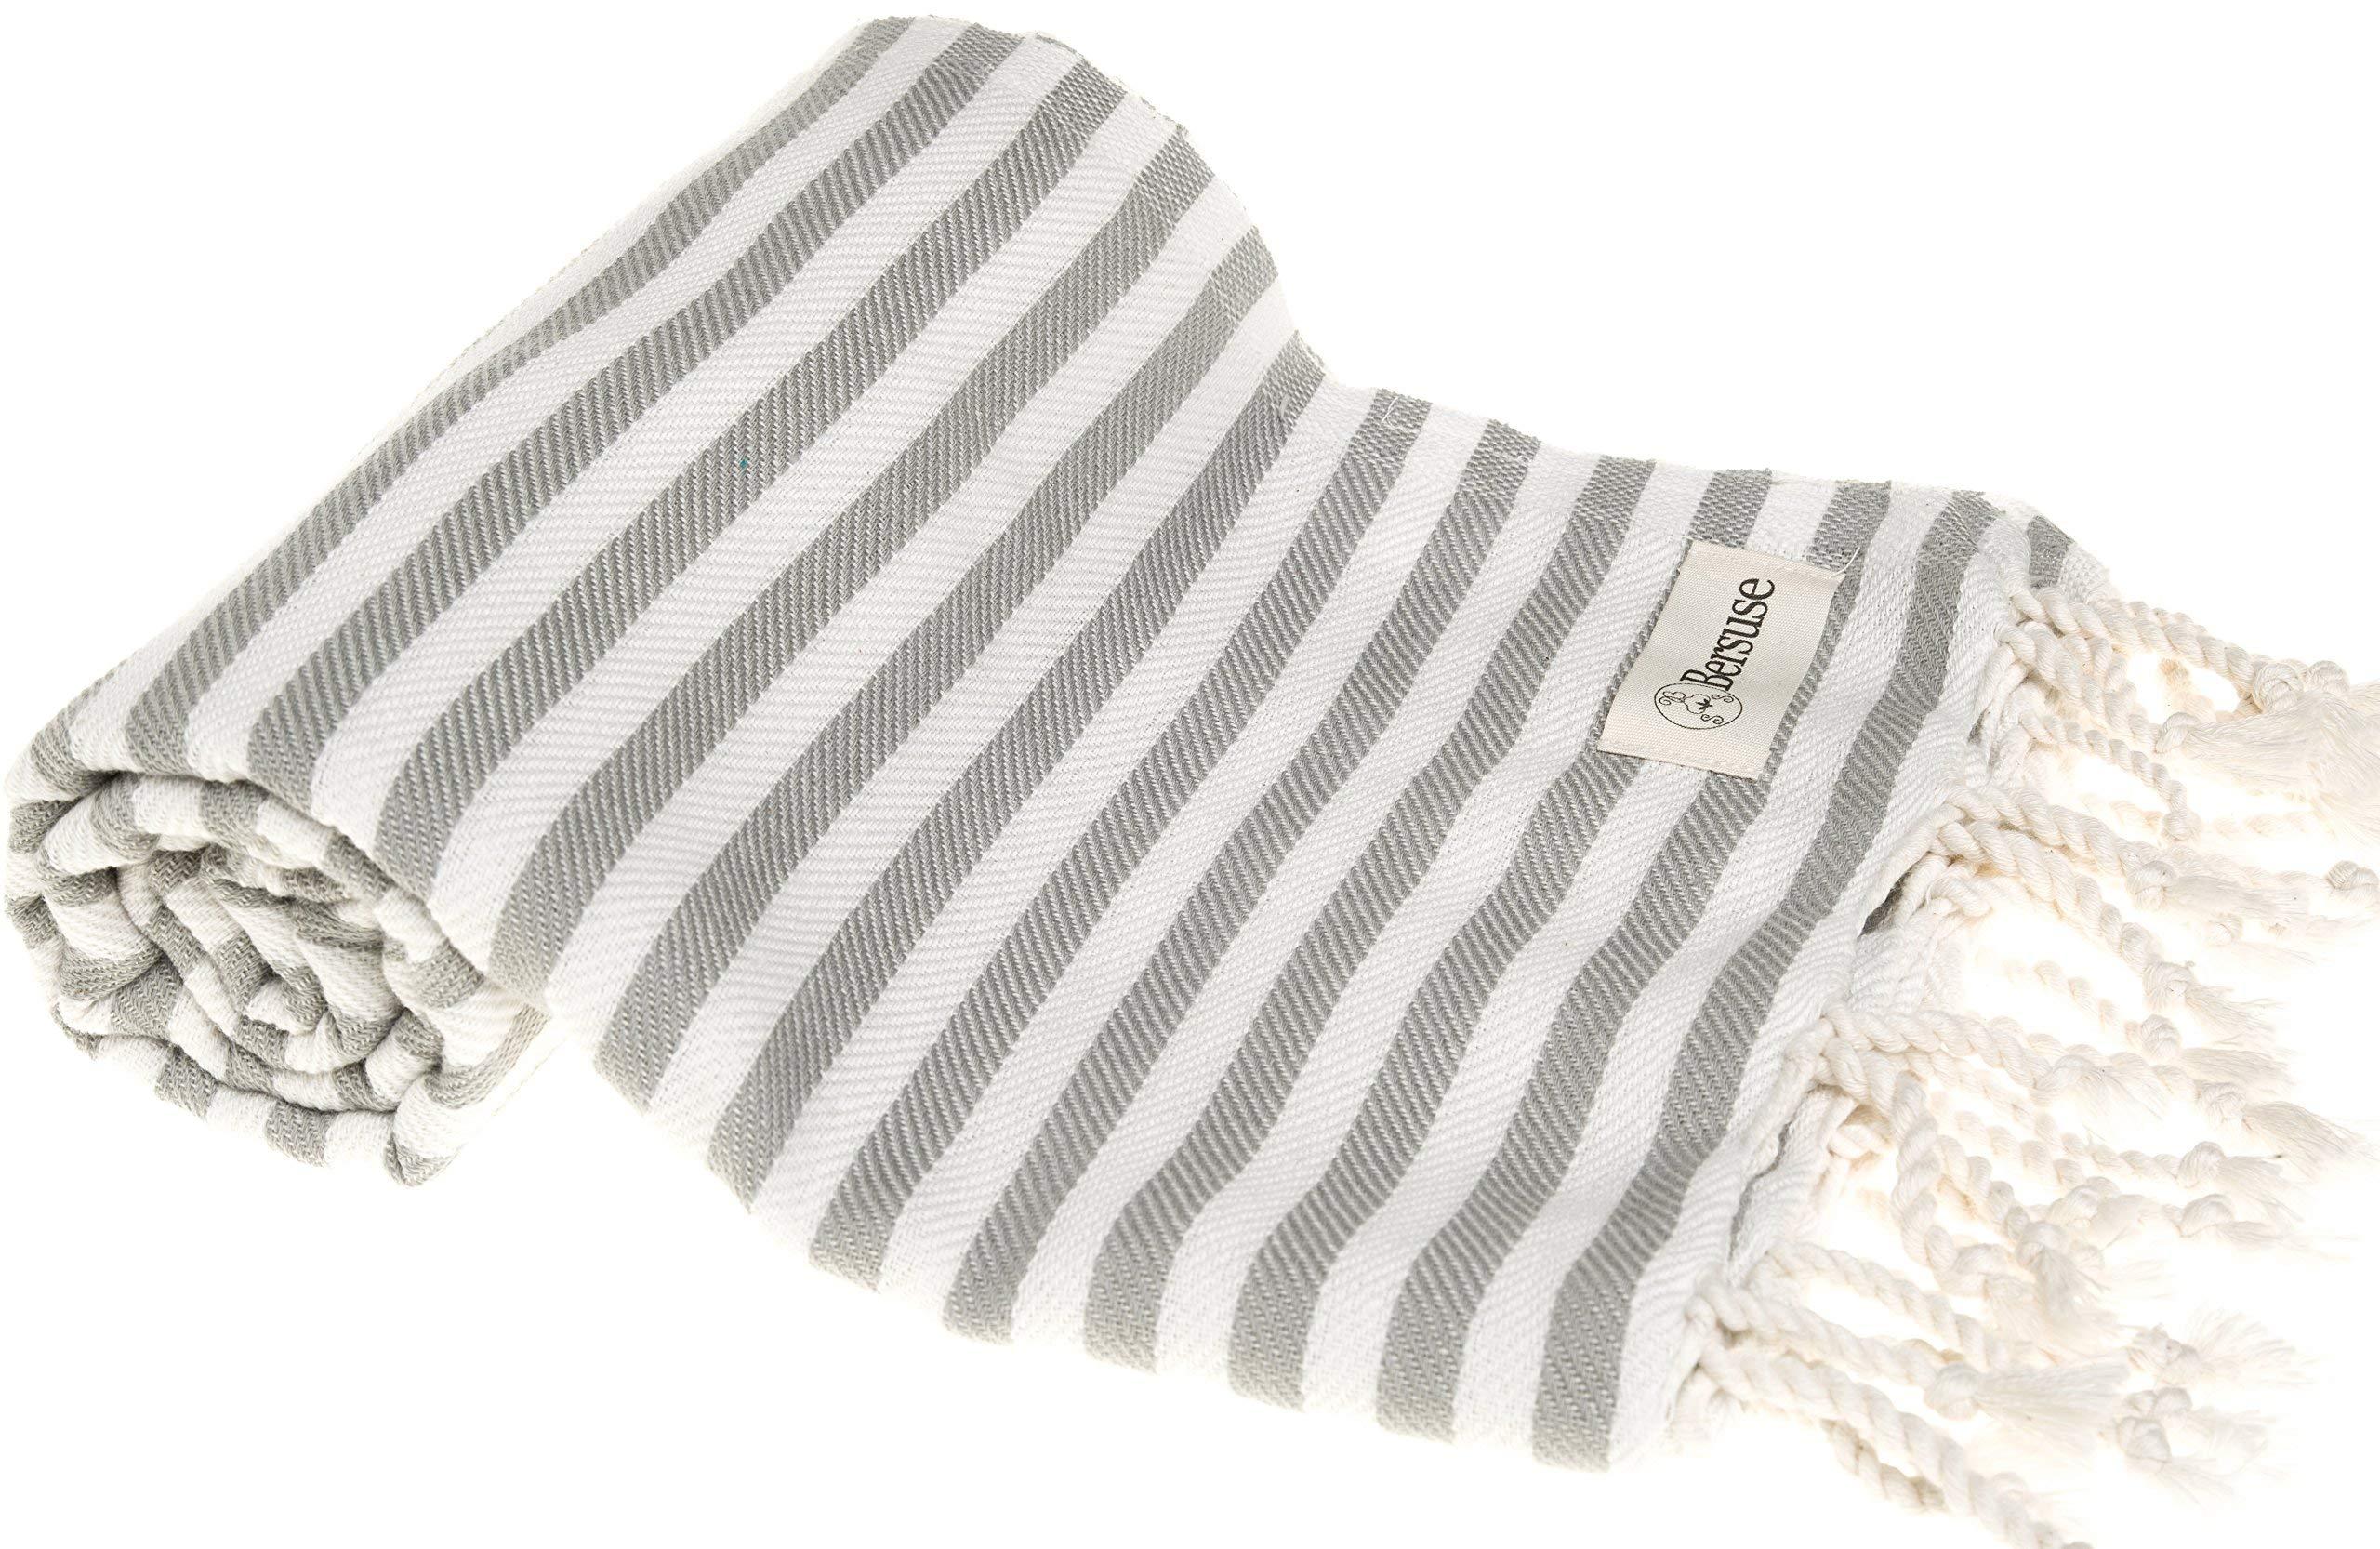 Bersuse 100% Cotton Malibu Turkish Towel, 37X70 Inches, Silver Gray